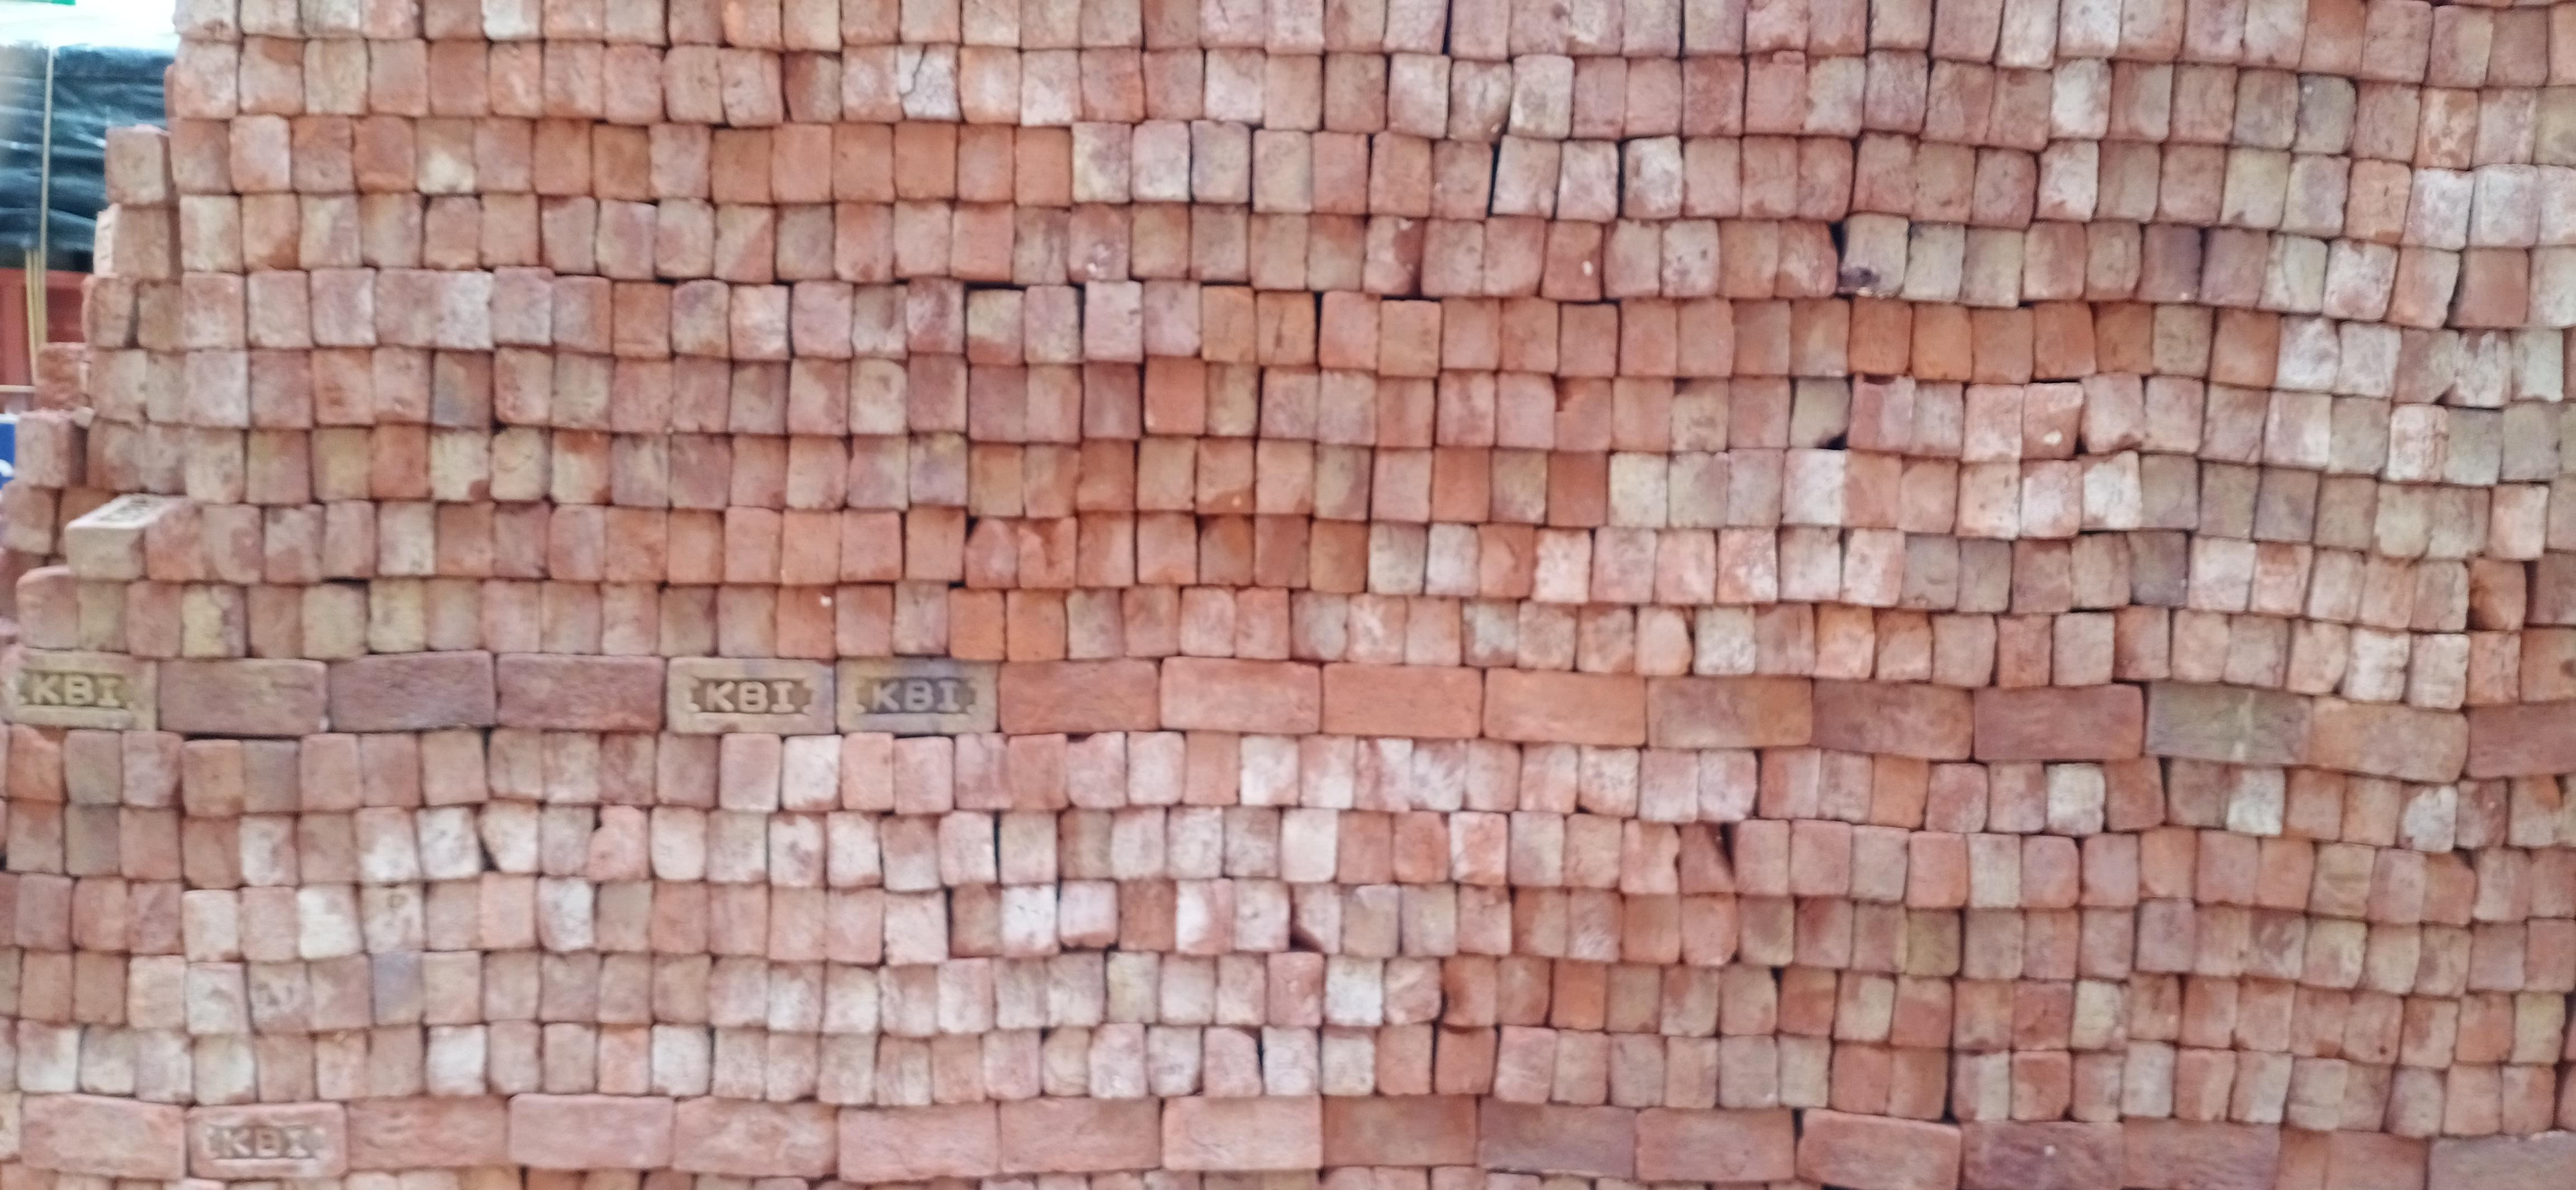 samanvi Bricks manufacturing & Supply